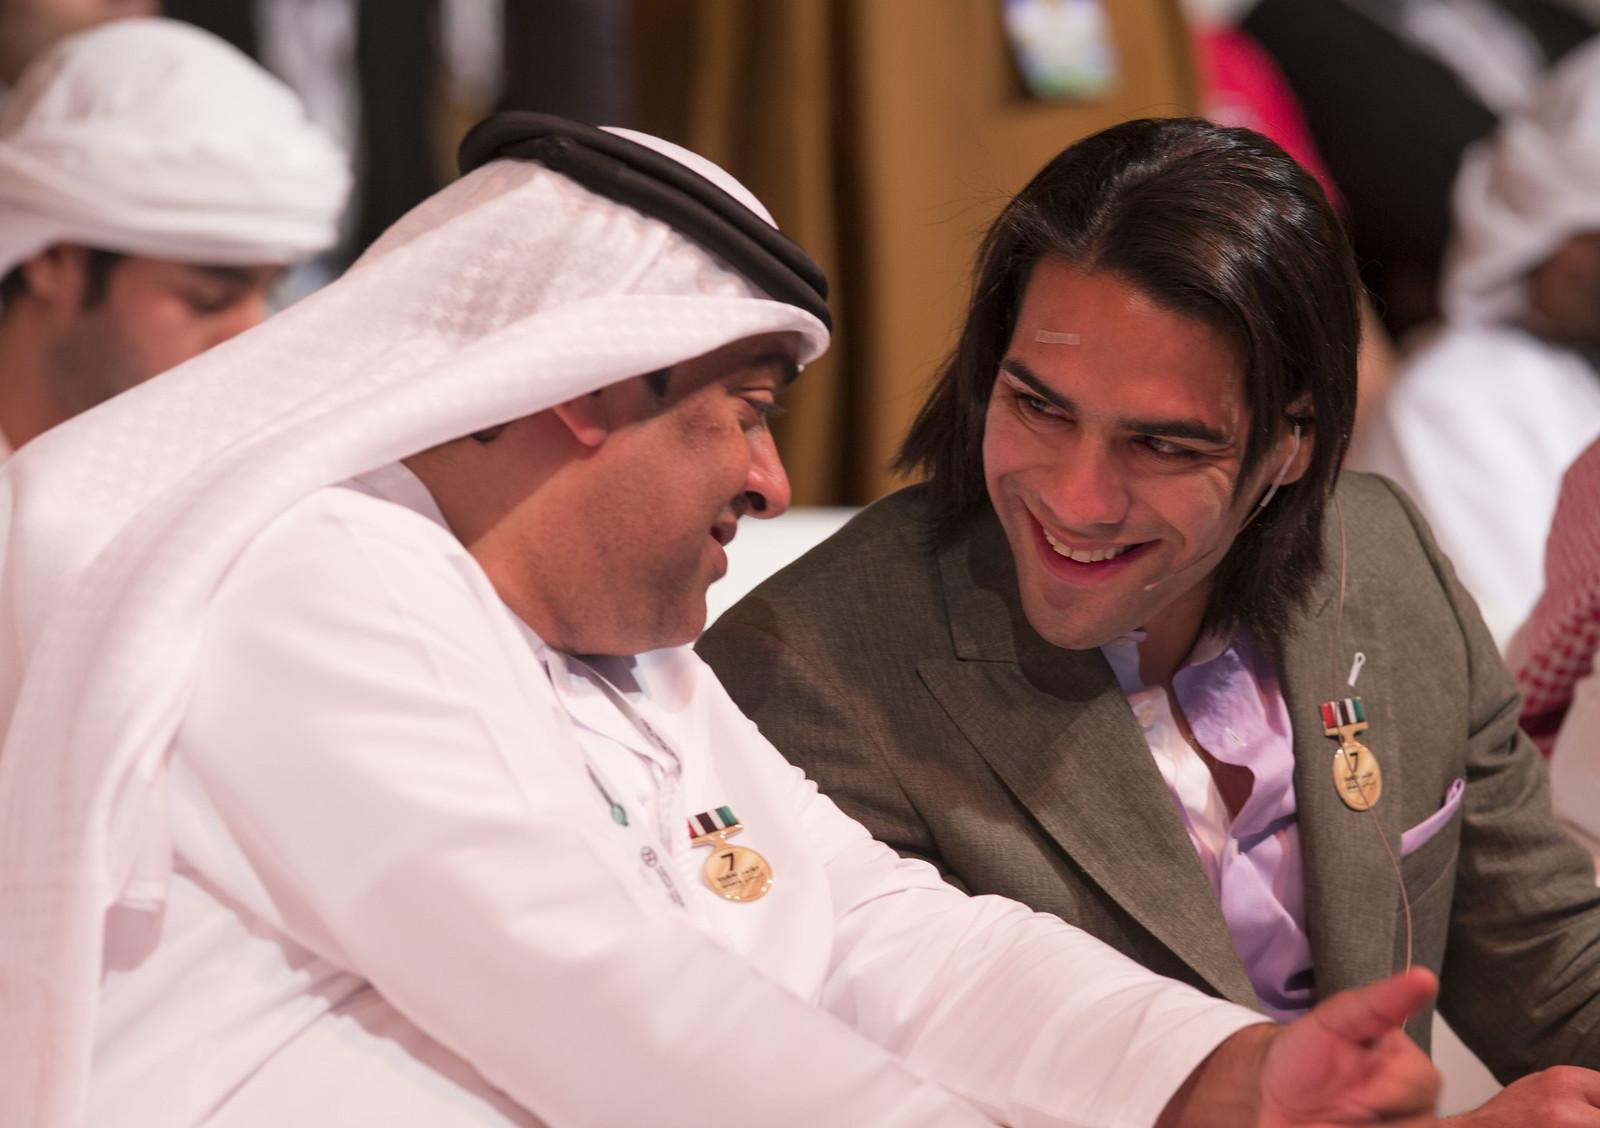 Mohamad Al Kamali and Radamel Falcao